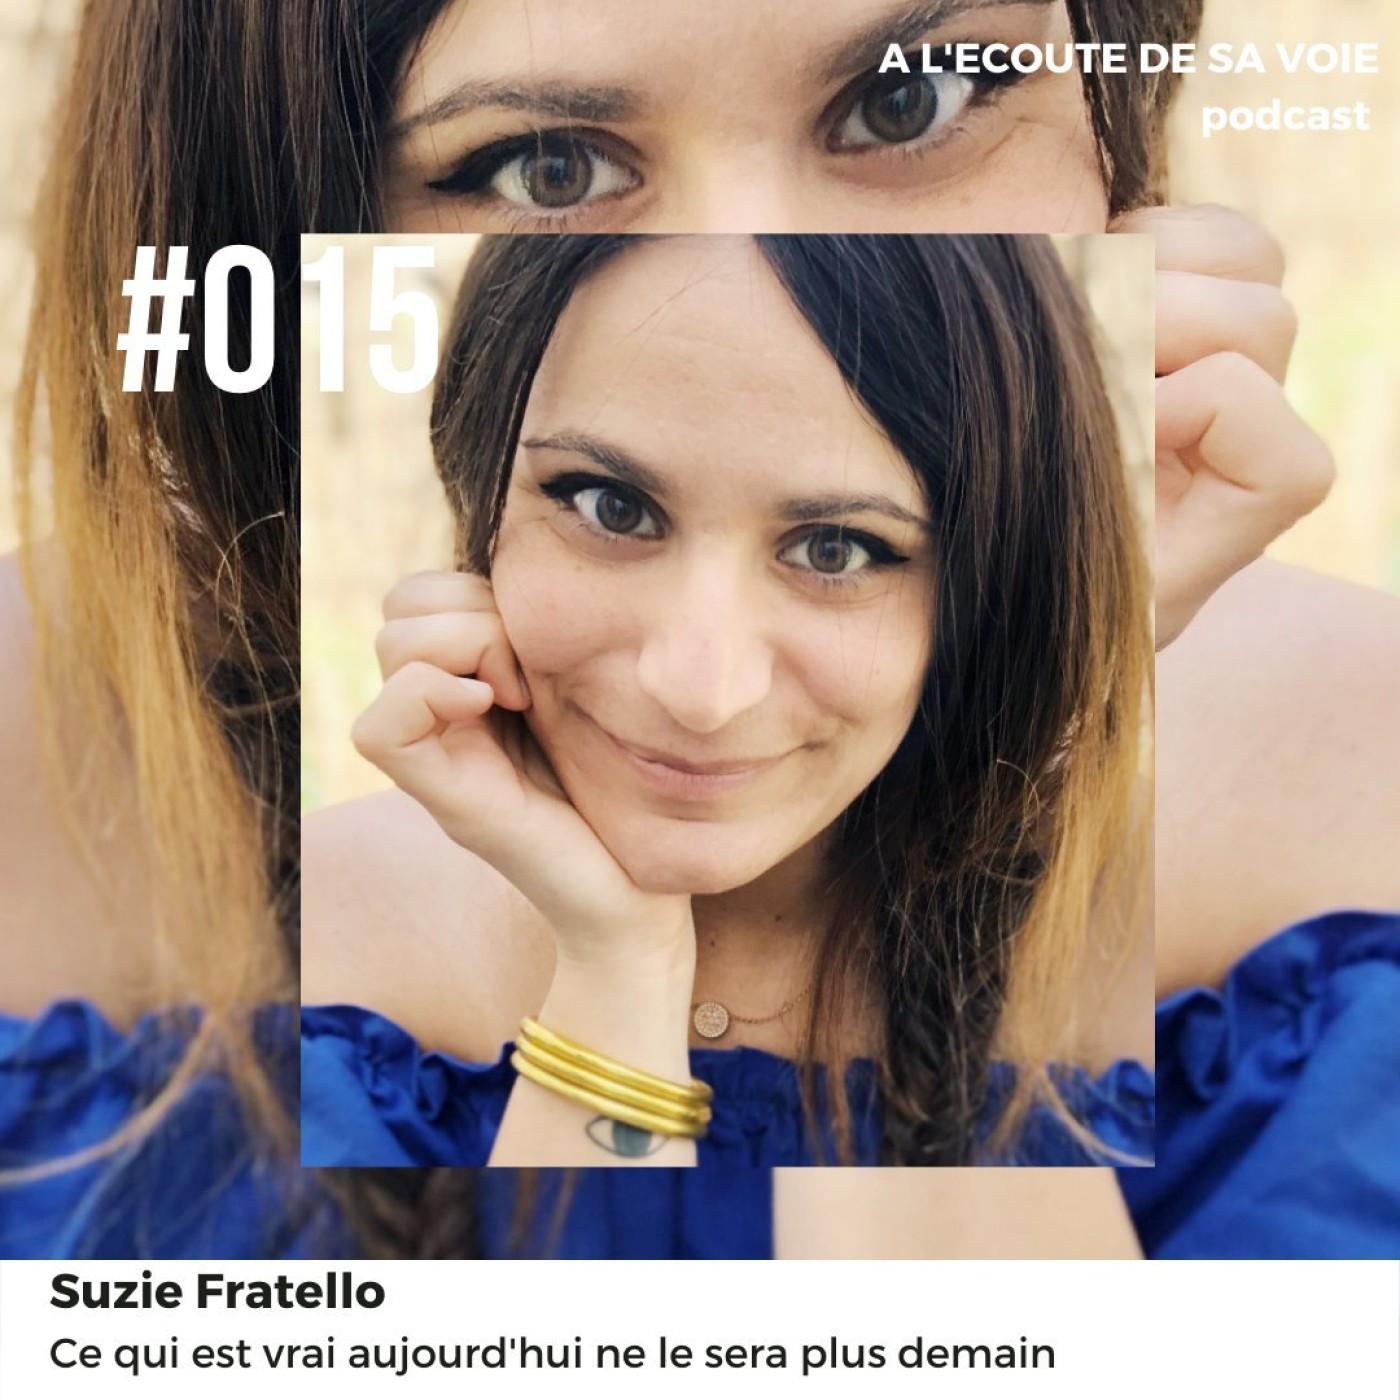 #015 Suzie Fratello - Ce qui est vrai aujourd'hui ne le sera plus demain